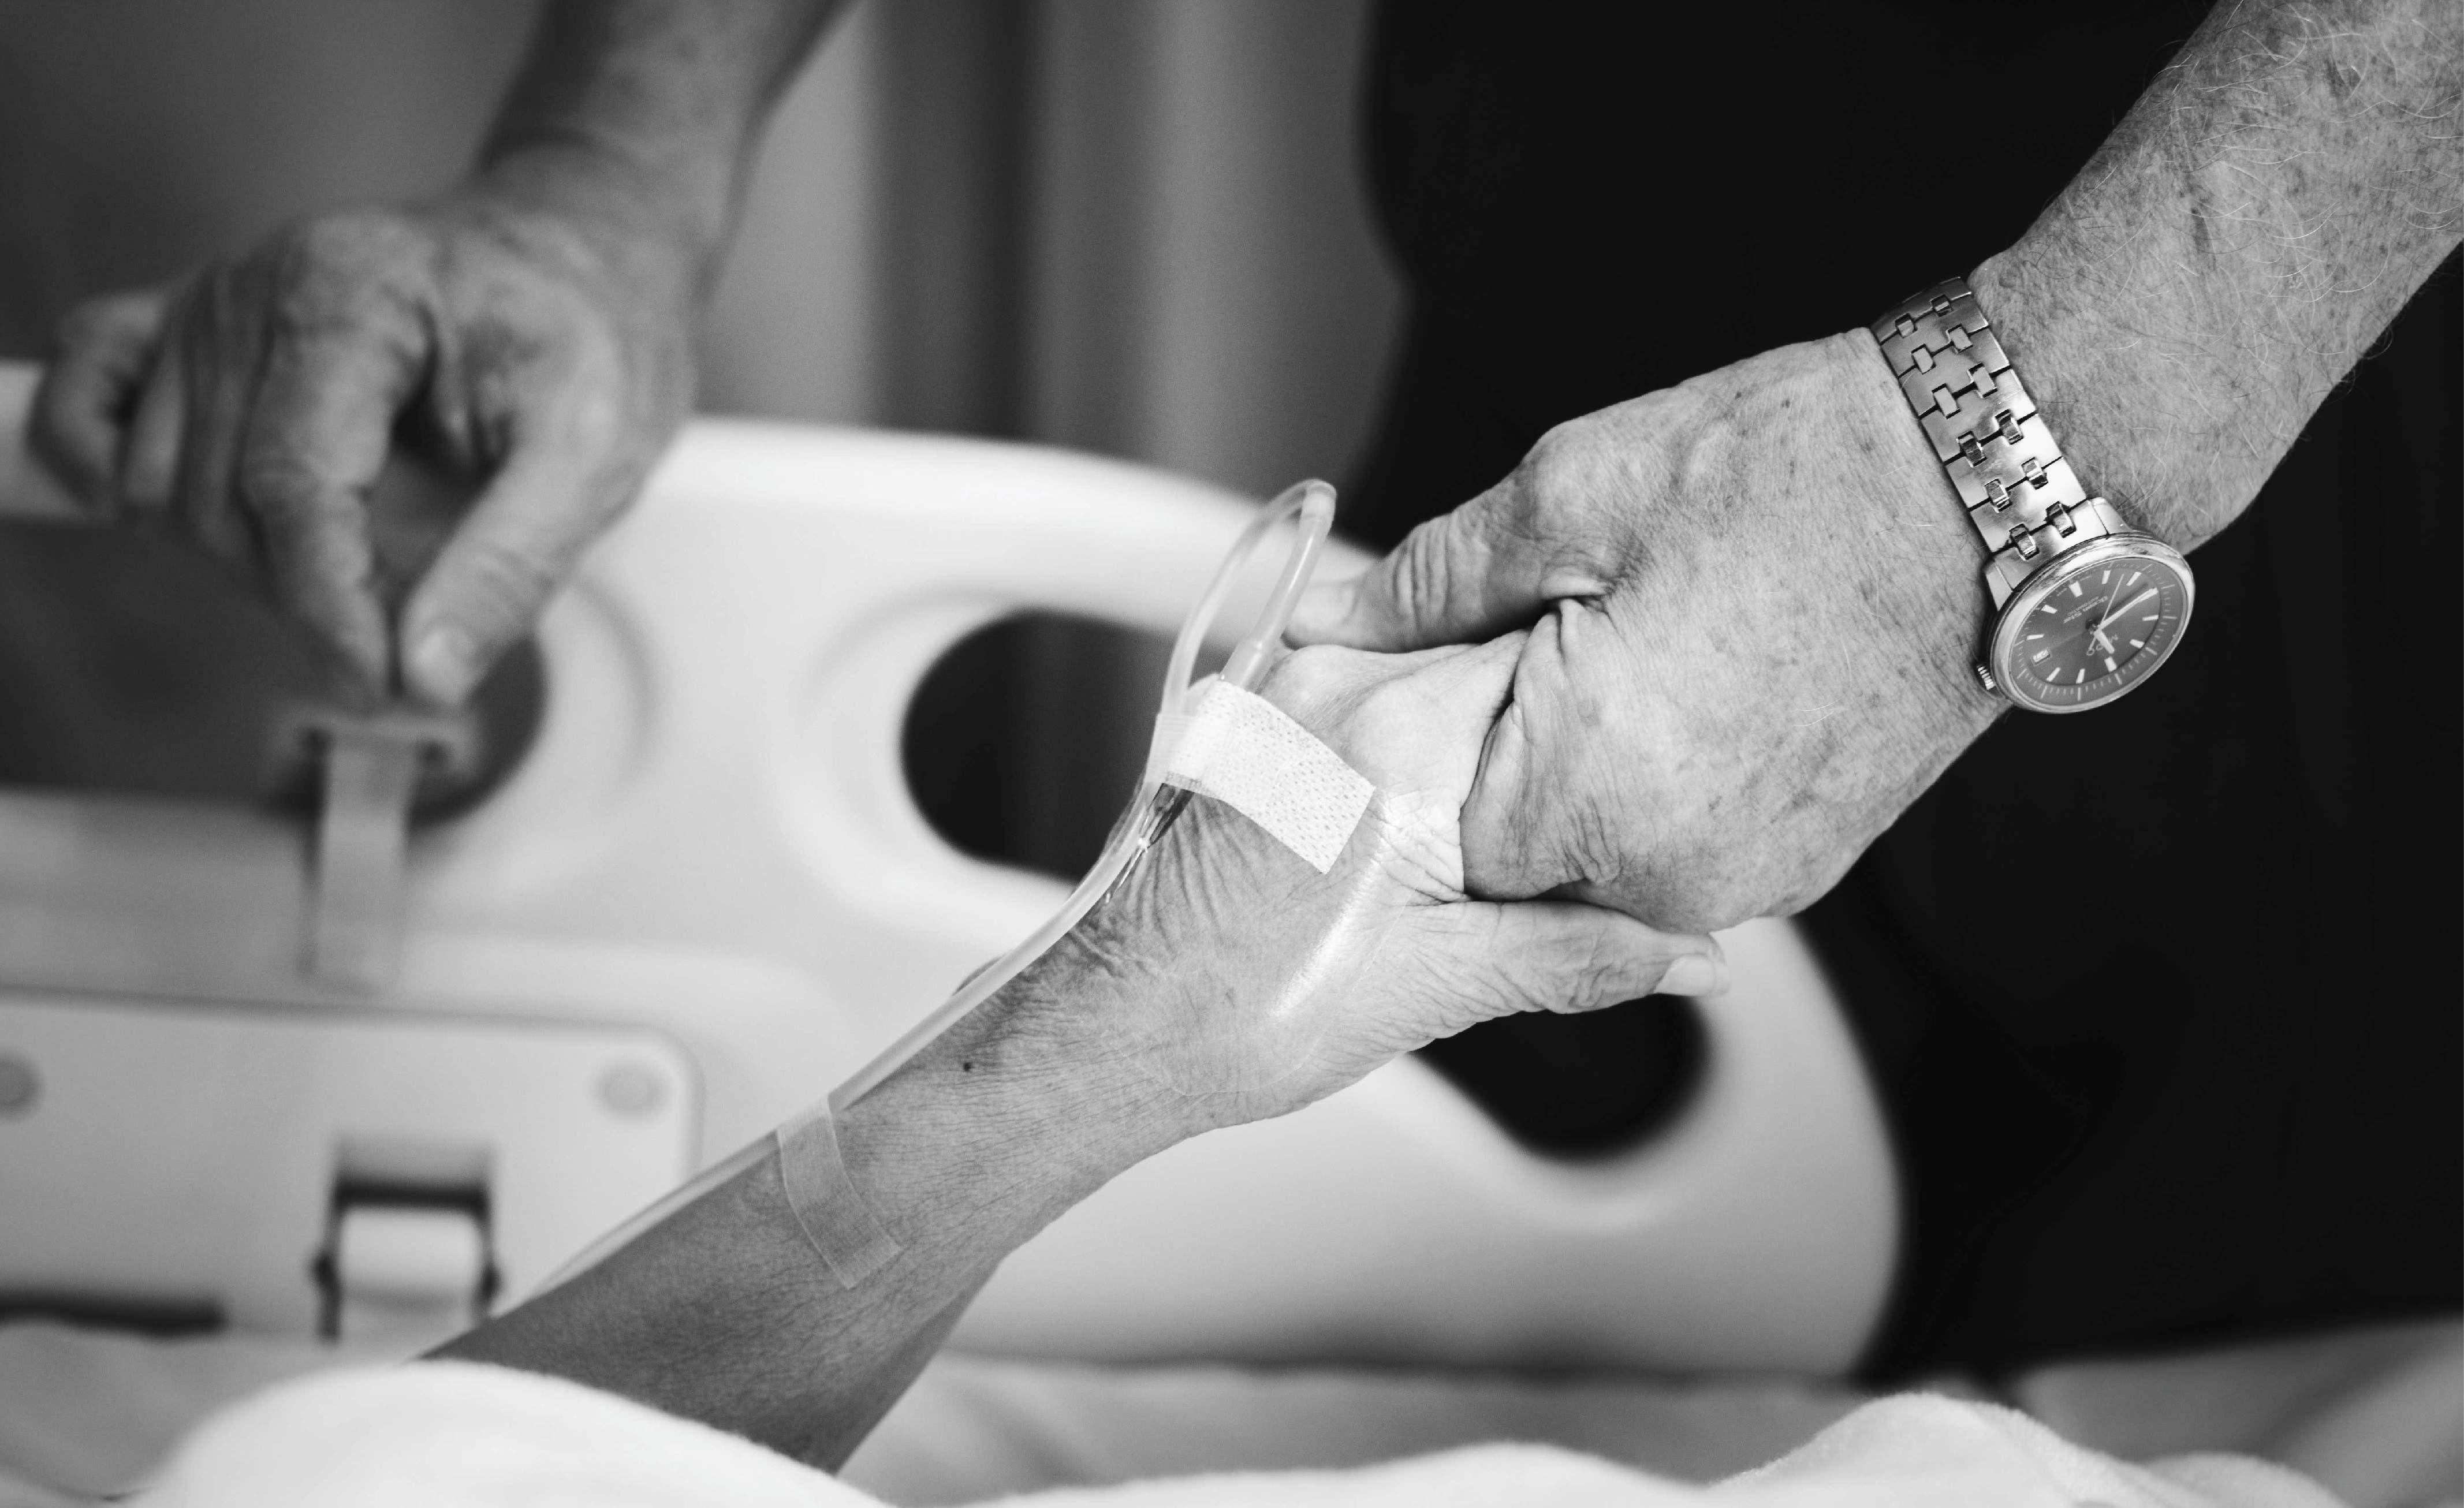 HDFC health insurance plans for senior citizens